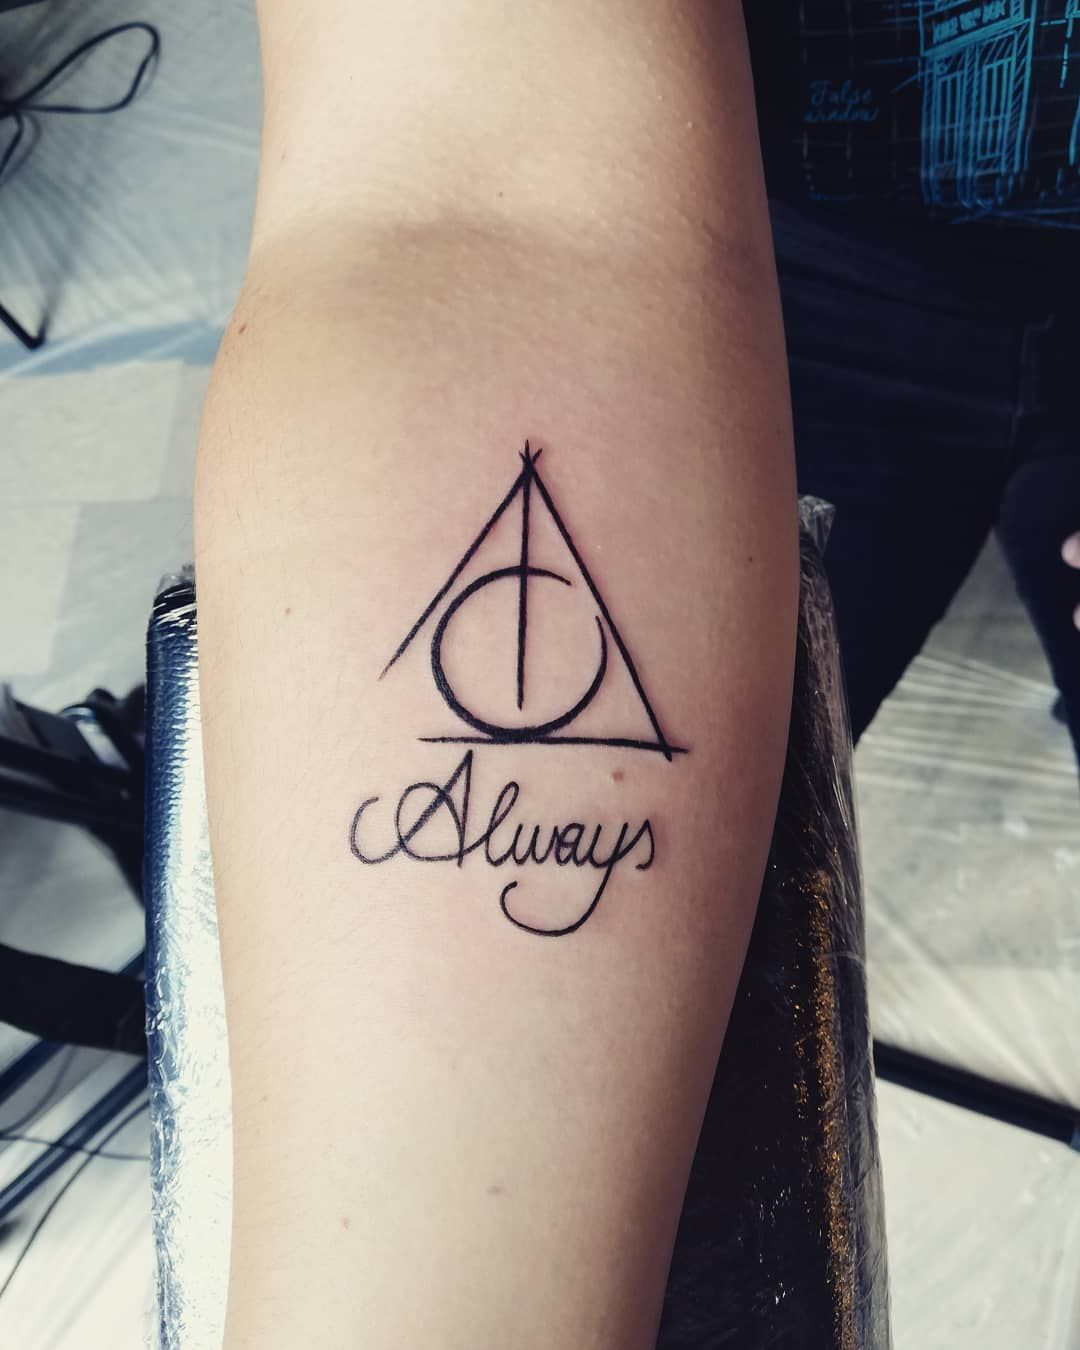 103 Tiny Harry Potter Tattoo Ideas That Any Witch Or Wizard Will Love Tiny Harry Potter Tattoos Harry Potter Tattoo Small Harry Potter Tattoos